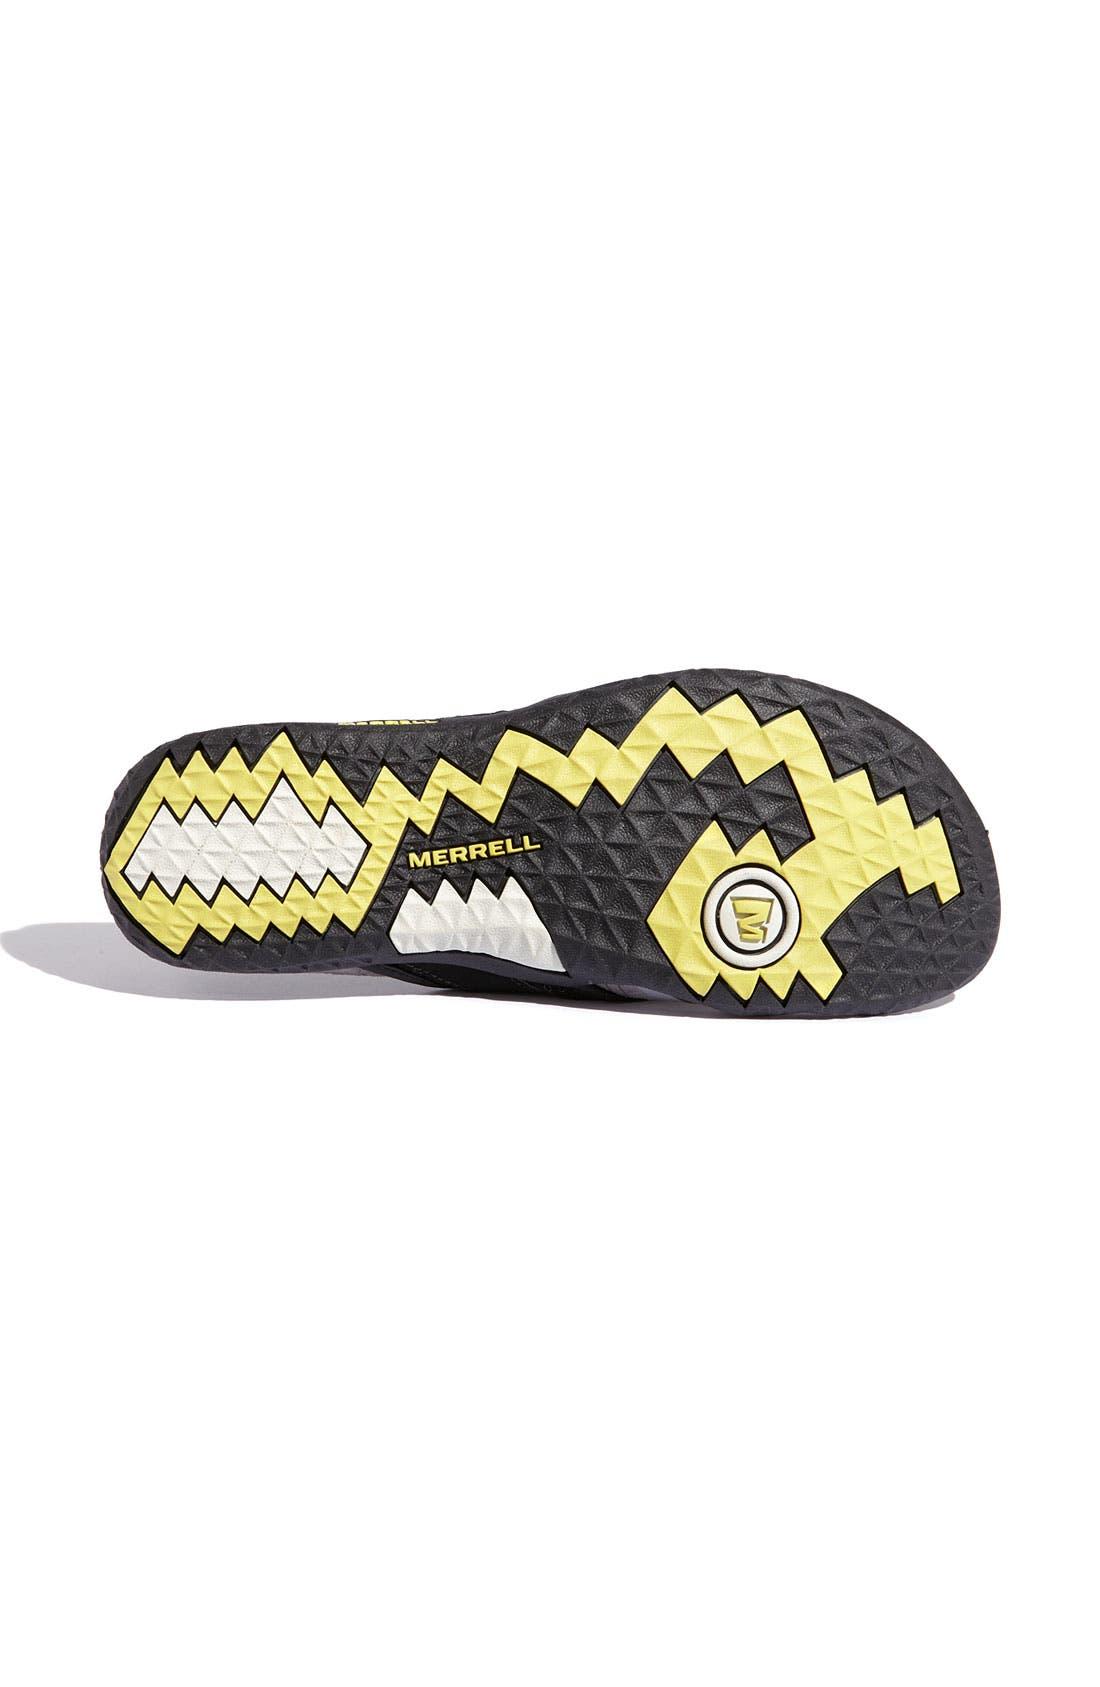 Alternate Image 4  - Merrell 'Lorelei' Sandal